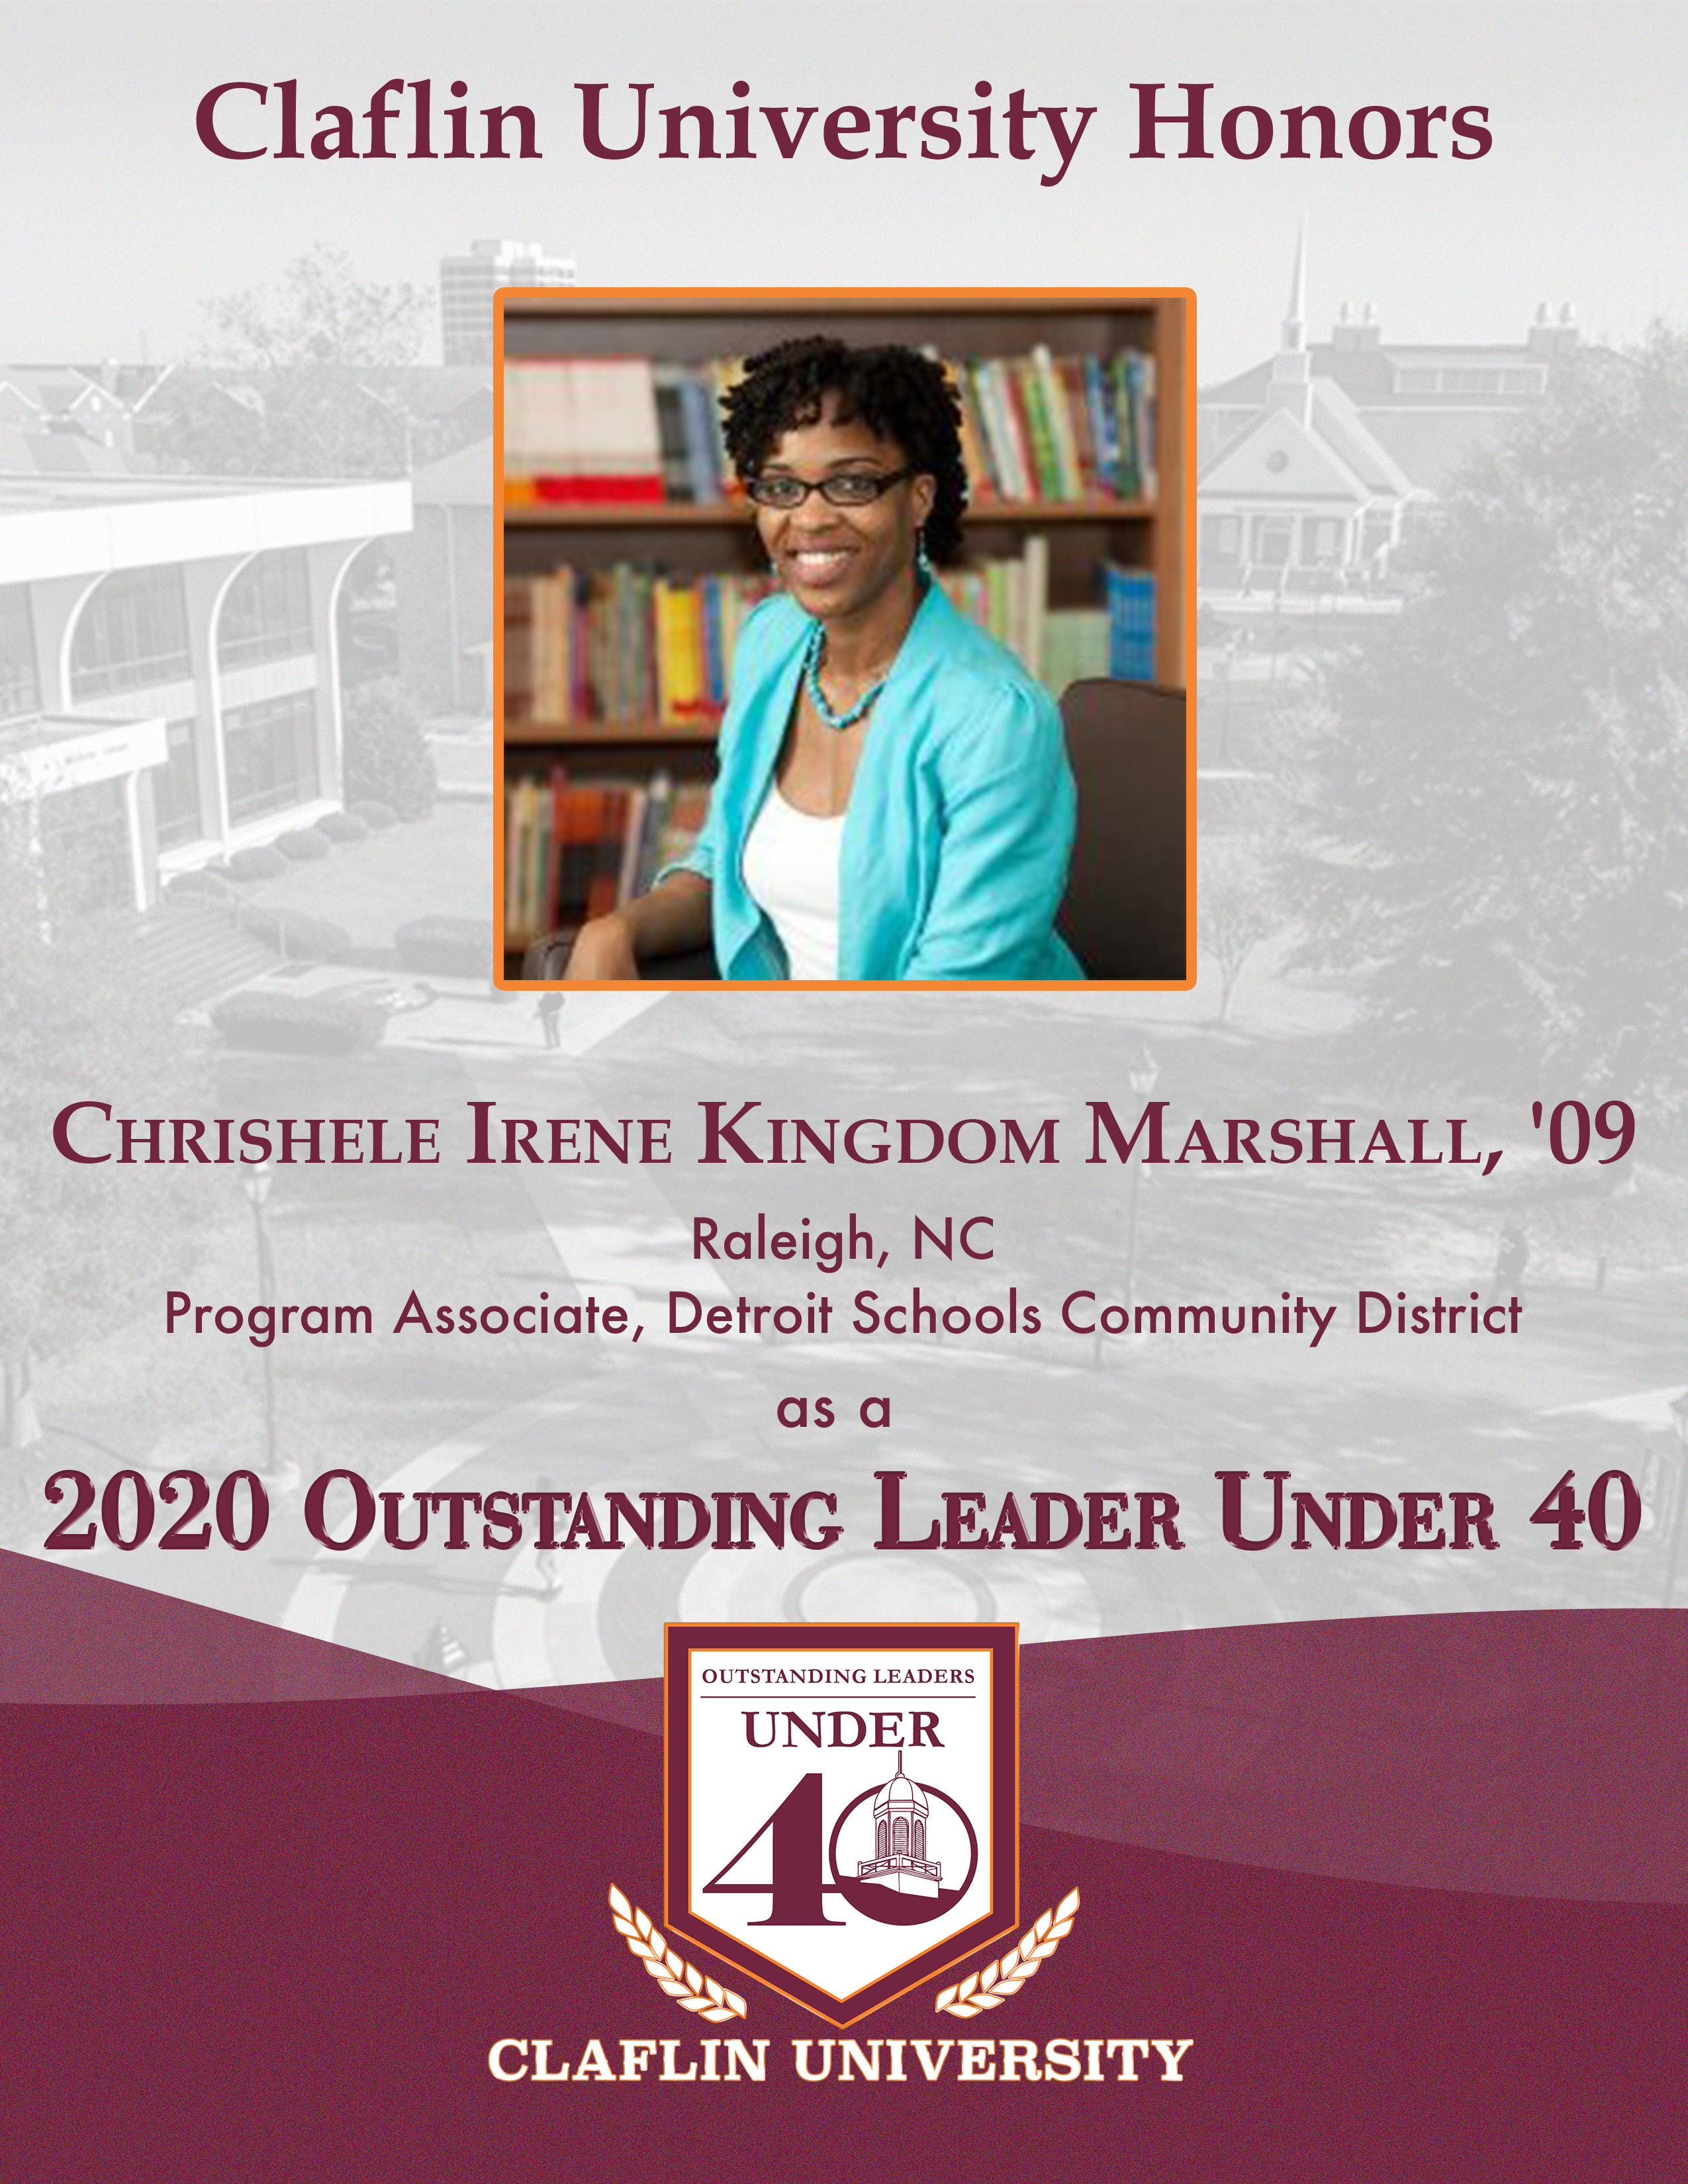 Chrishele Irene Kingdom Marshall